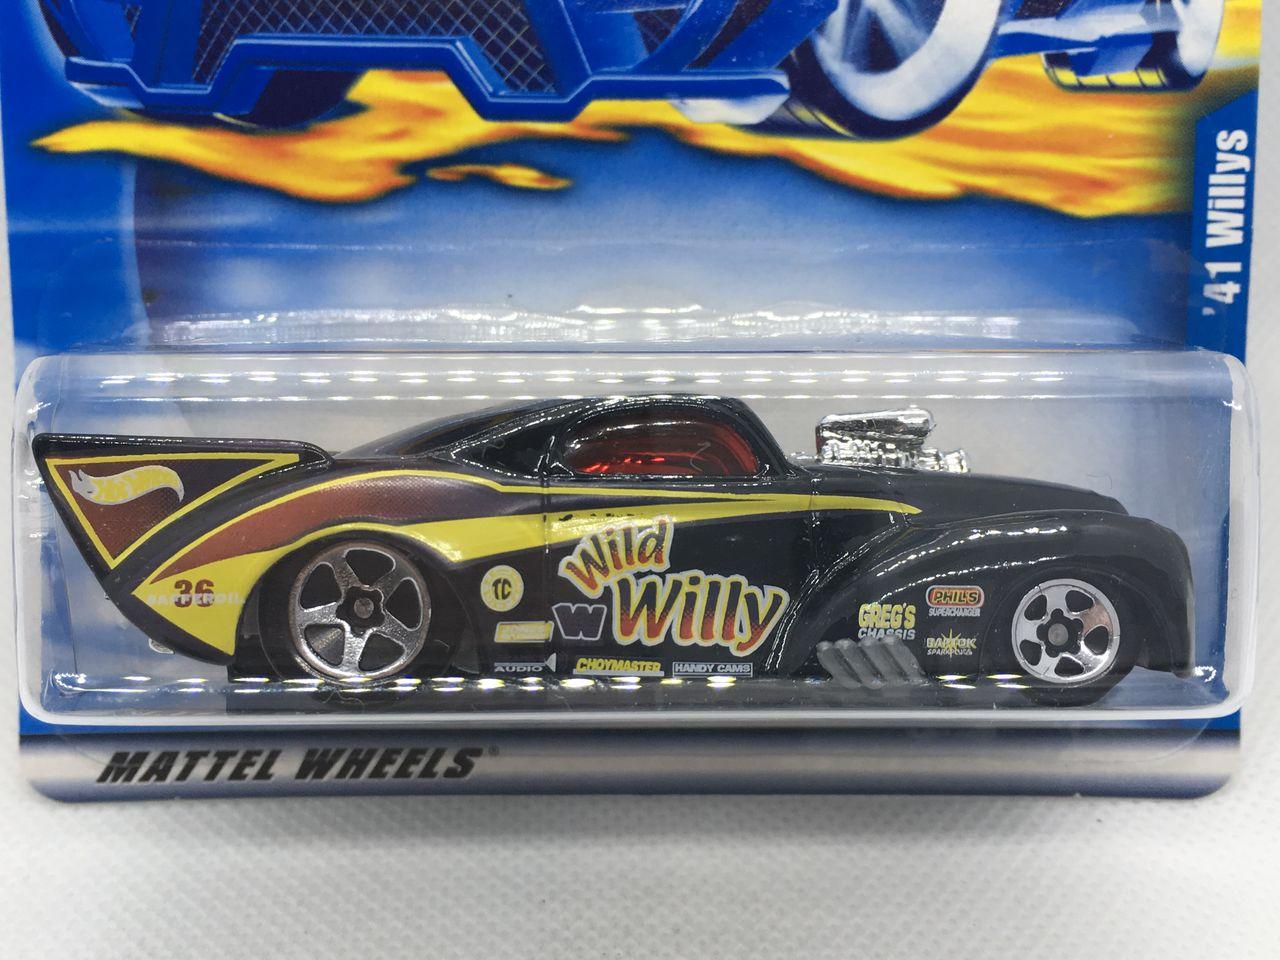 2001 Hot Wheels #110 /'41 Willys